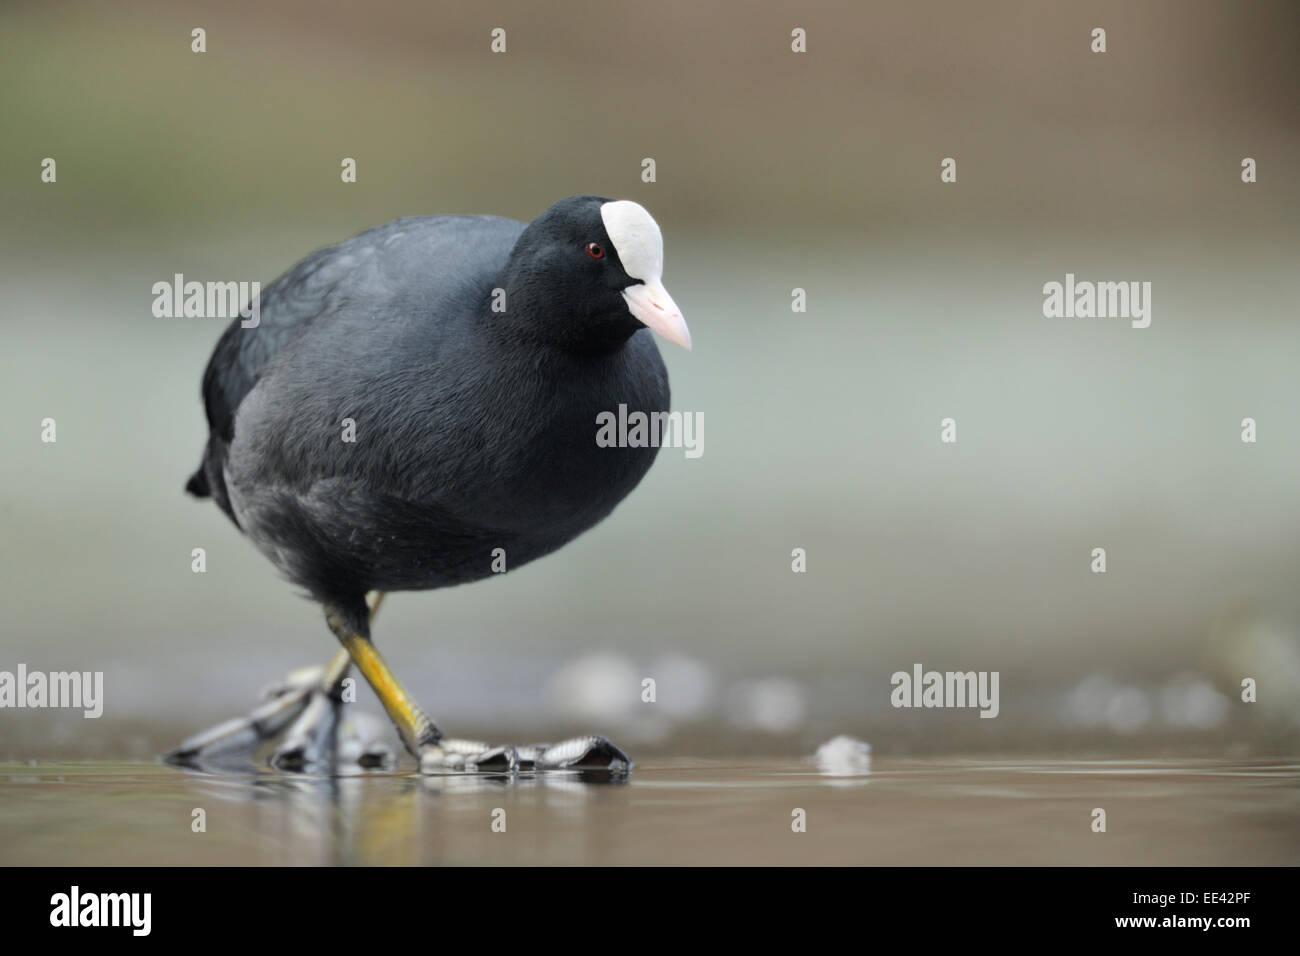 (Eurasian) black coot [Fulica atra], blaesshuhn, germany - Stock Image